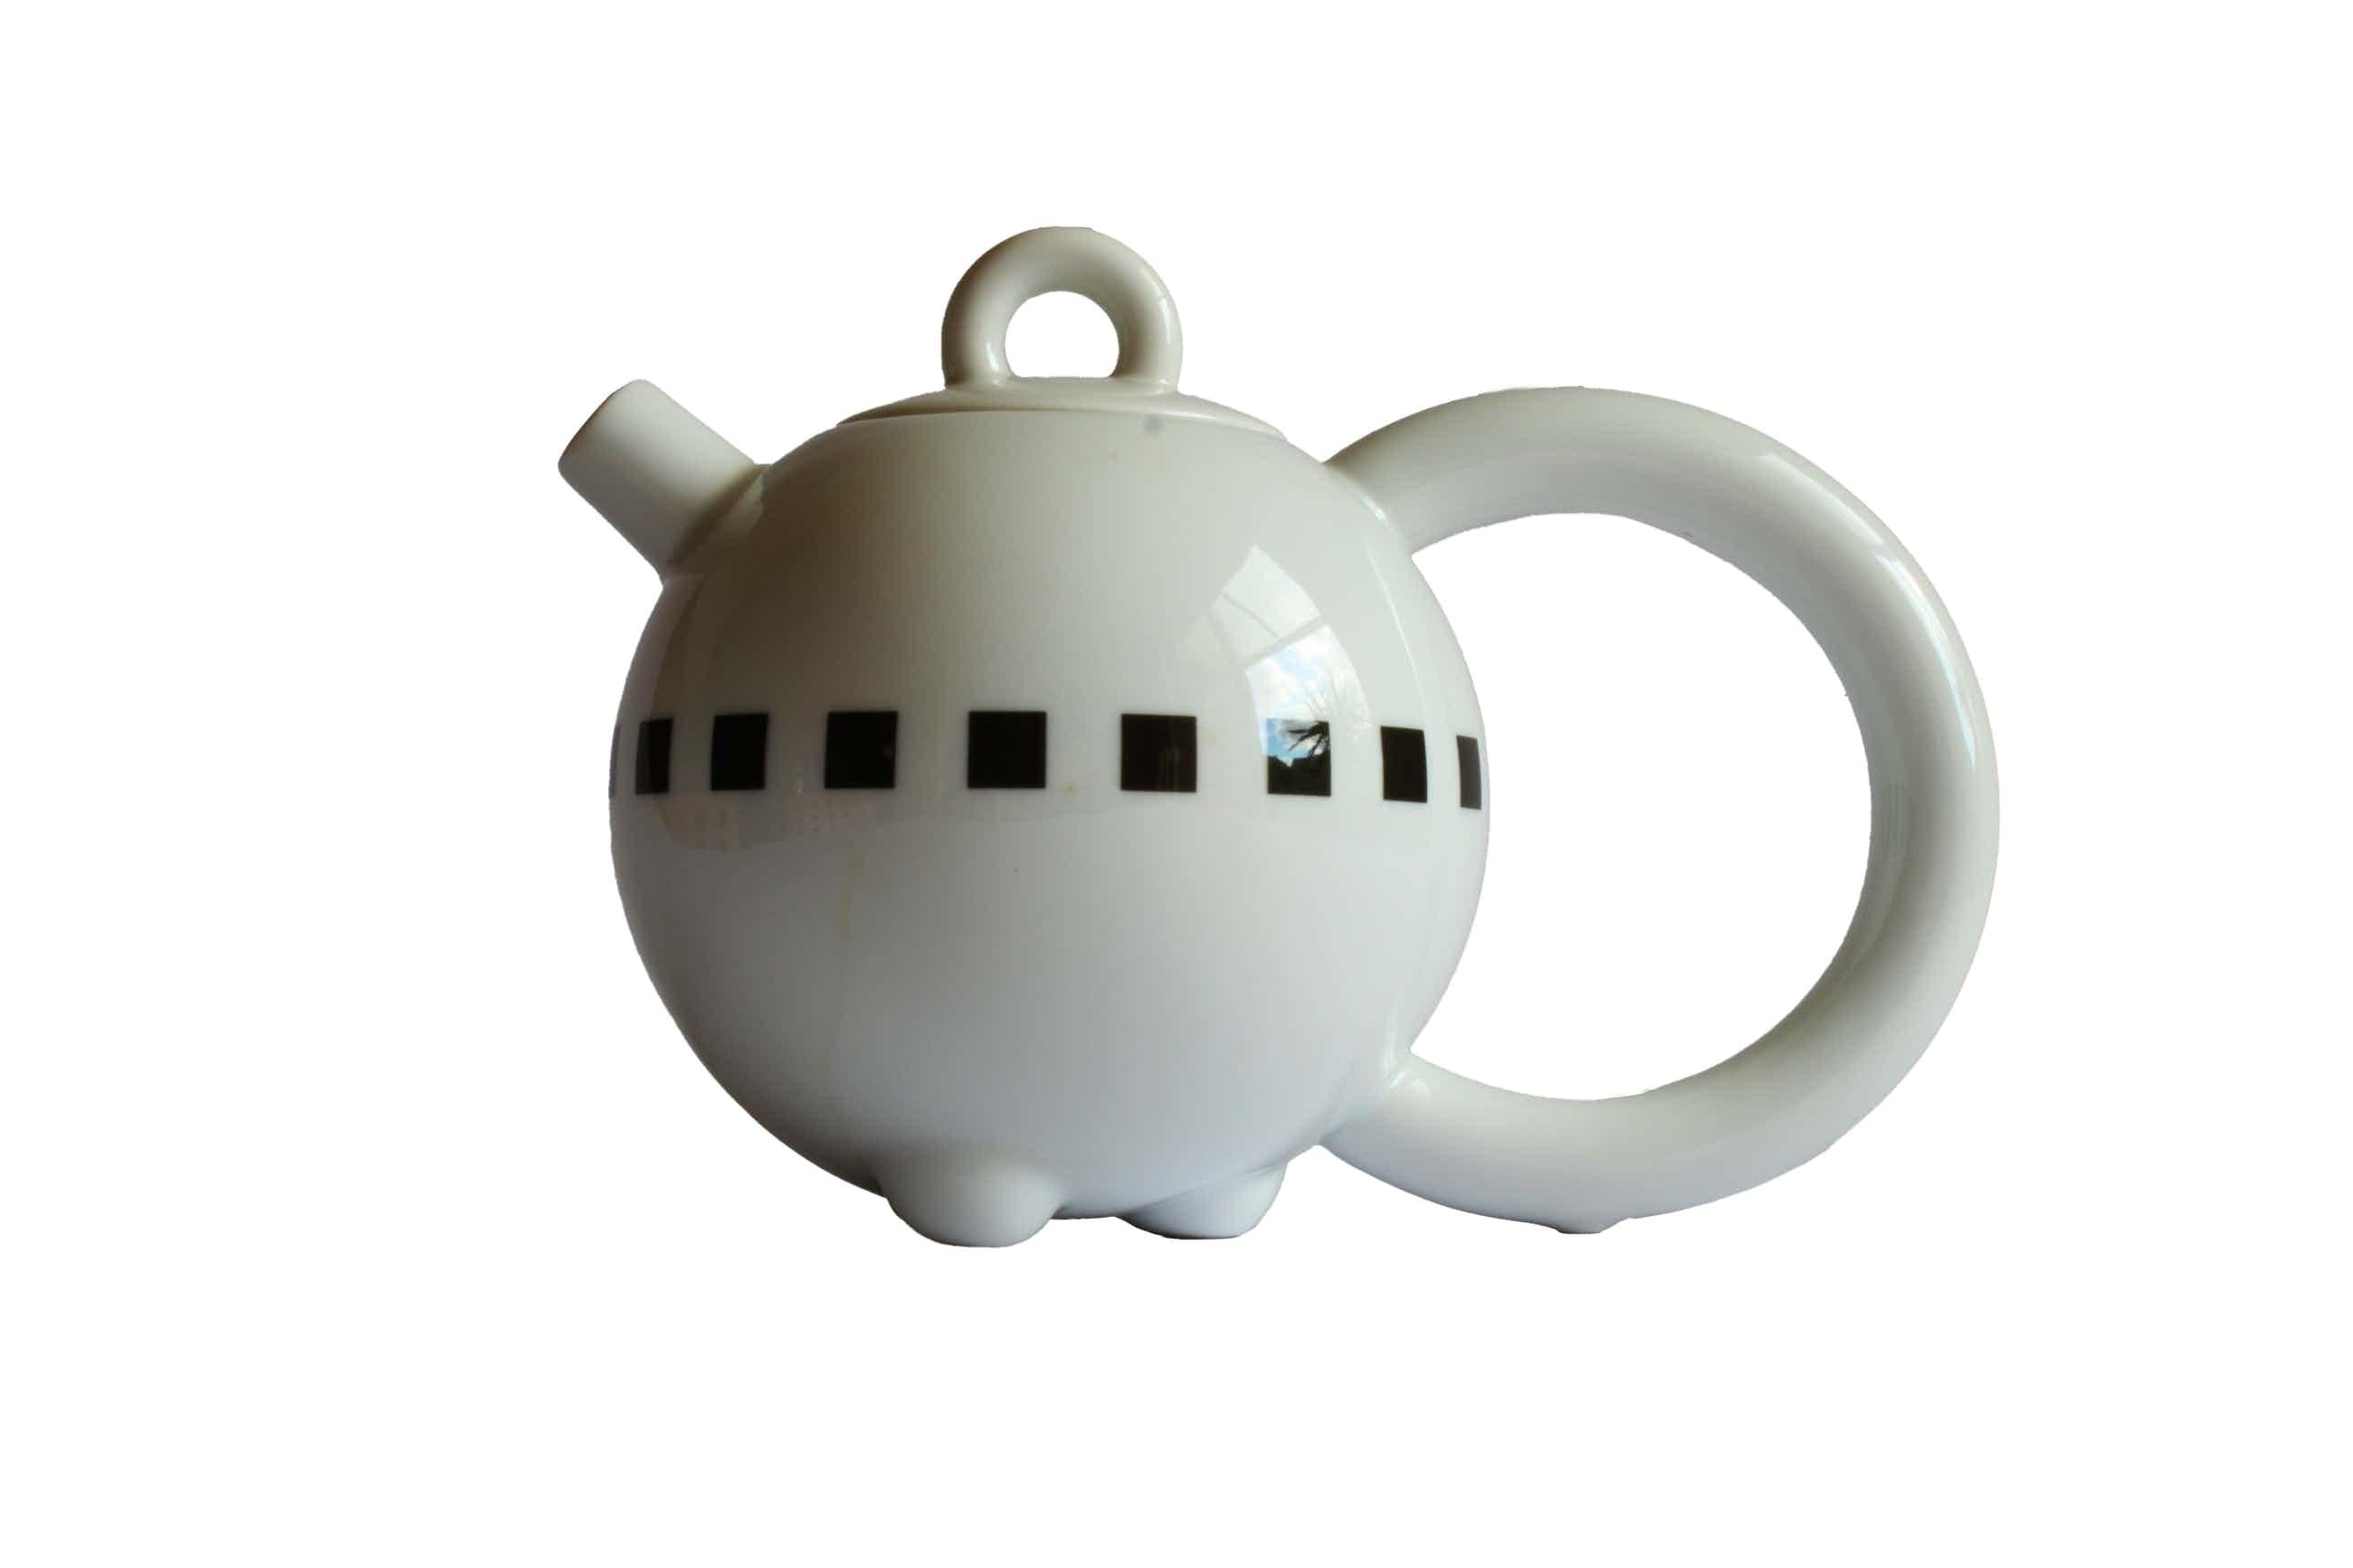 Matteo Thun - Fantasia Teapot kopen? Bied vanaf 50!